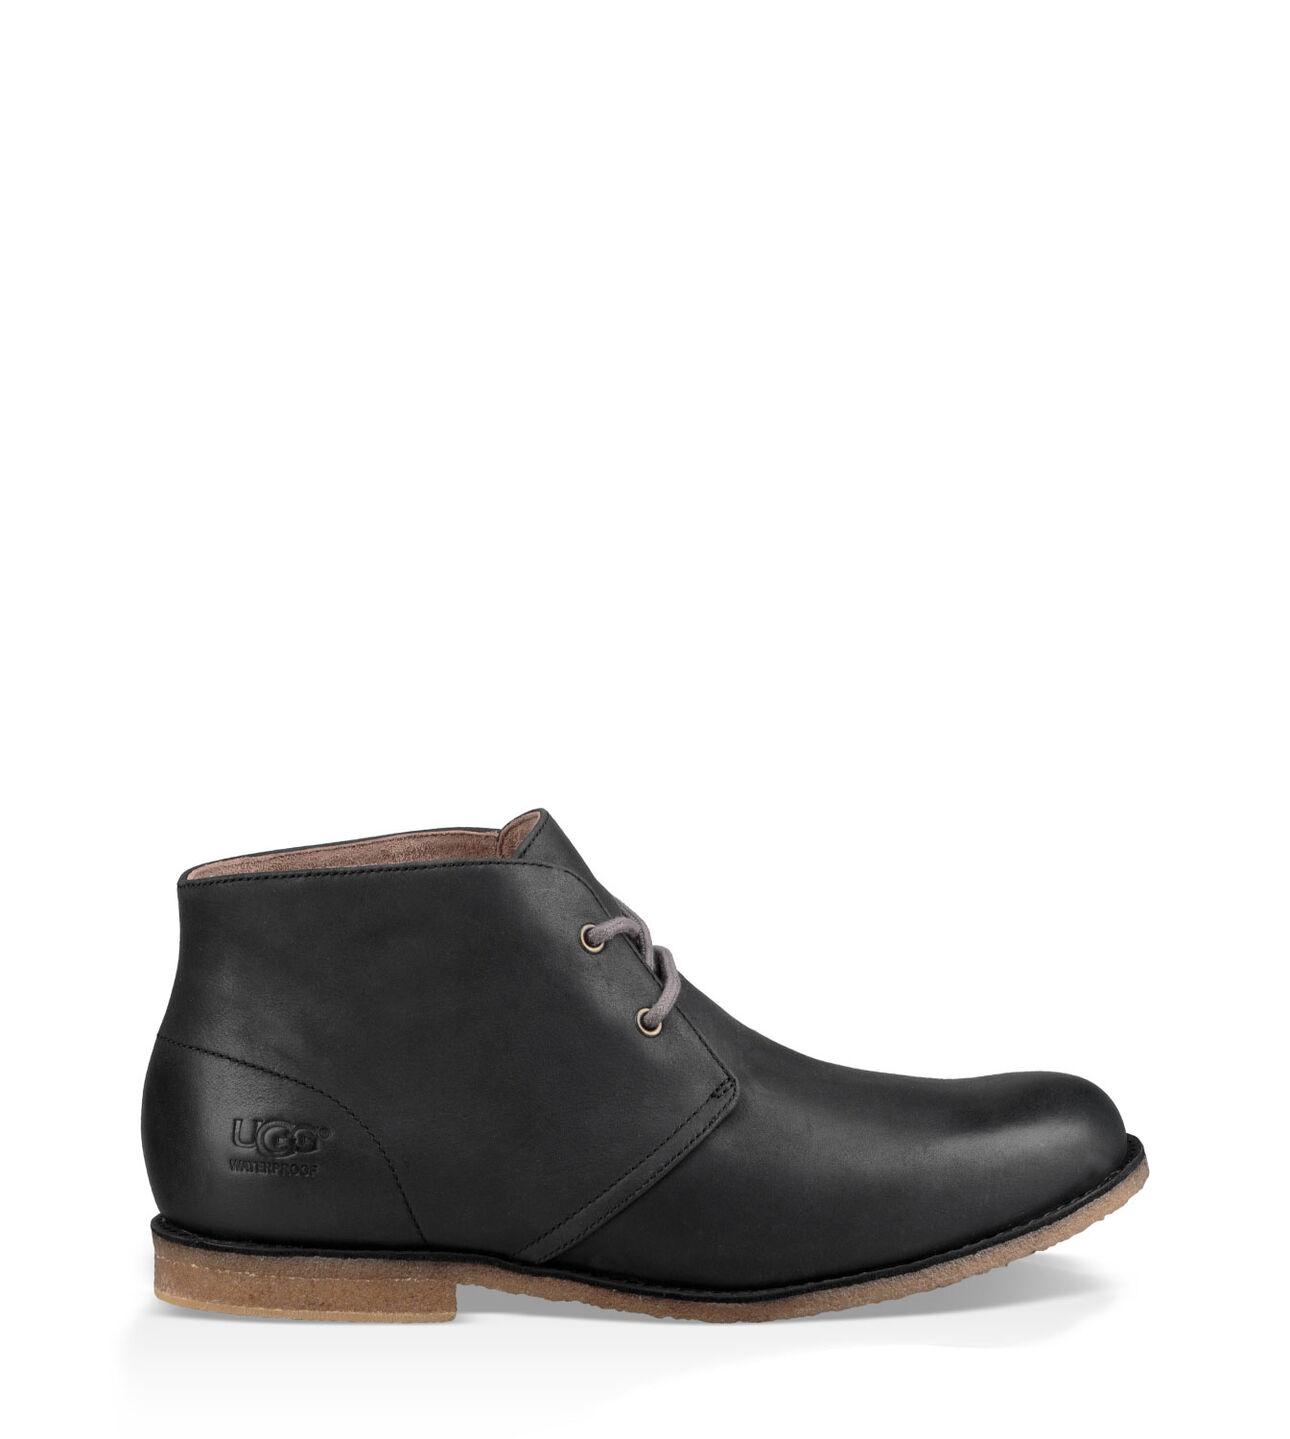 ecfa187ed62 Ugg Australia Leighton Leather Desert Boots